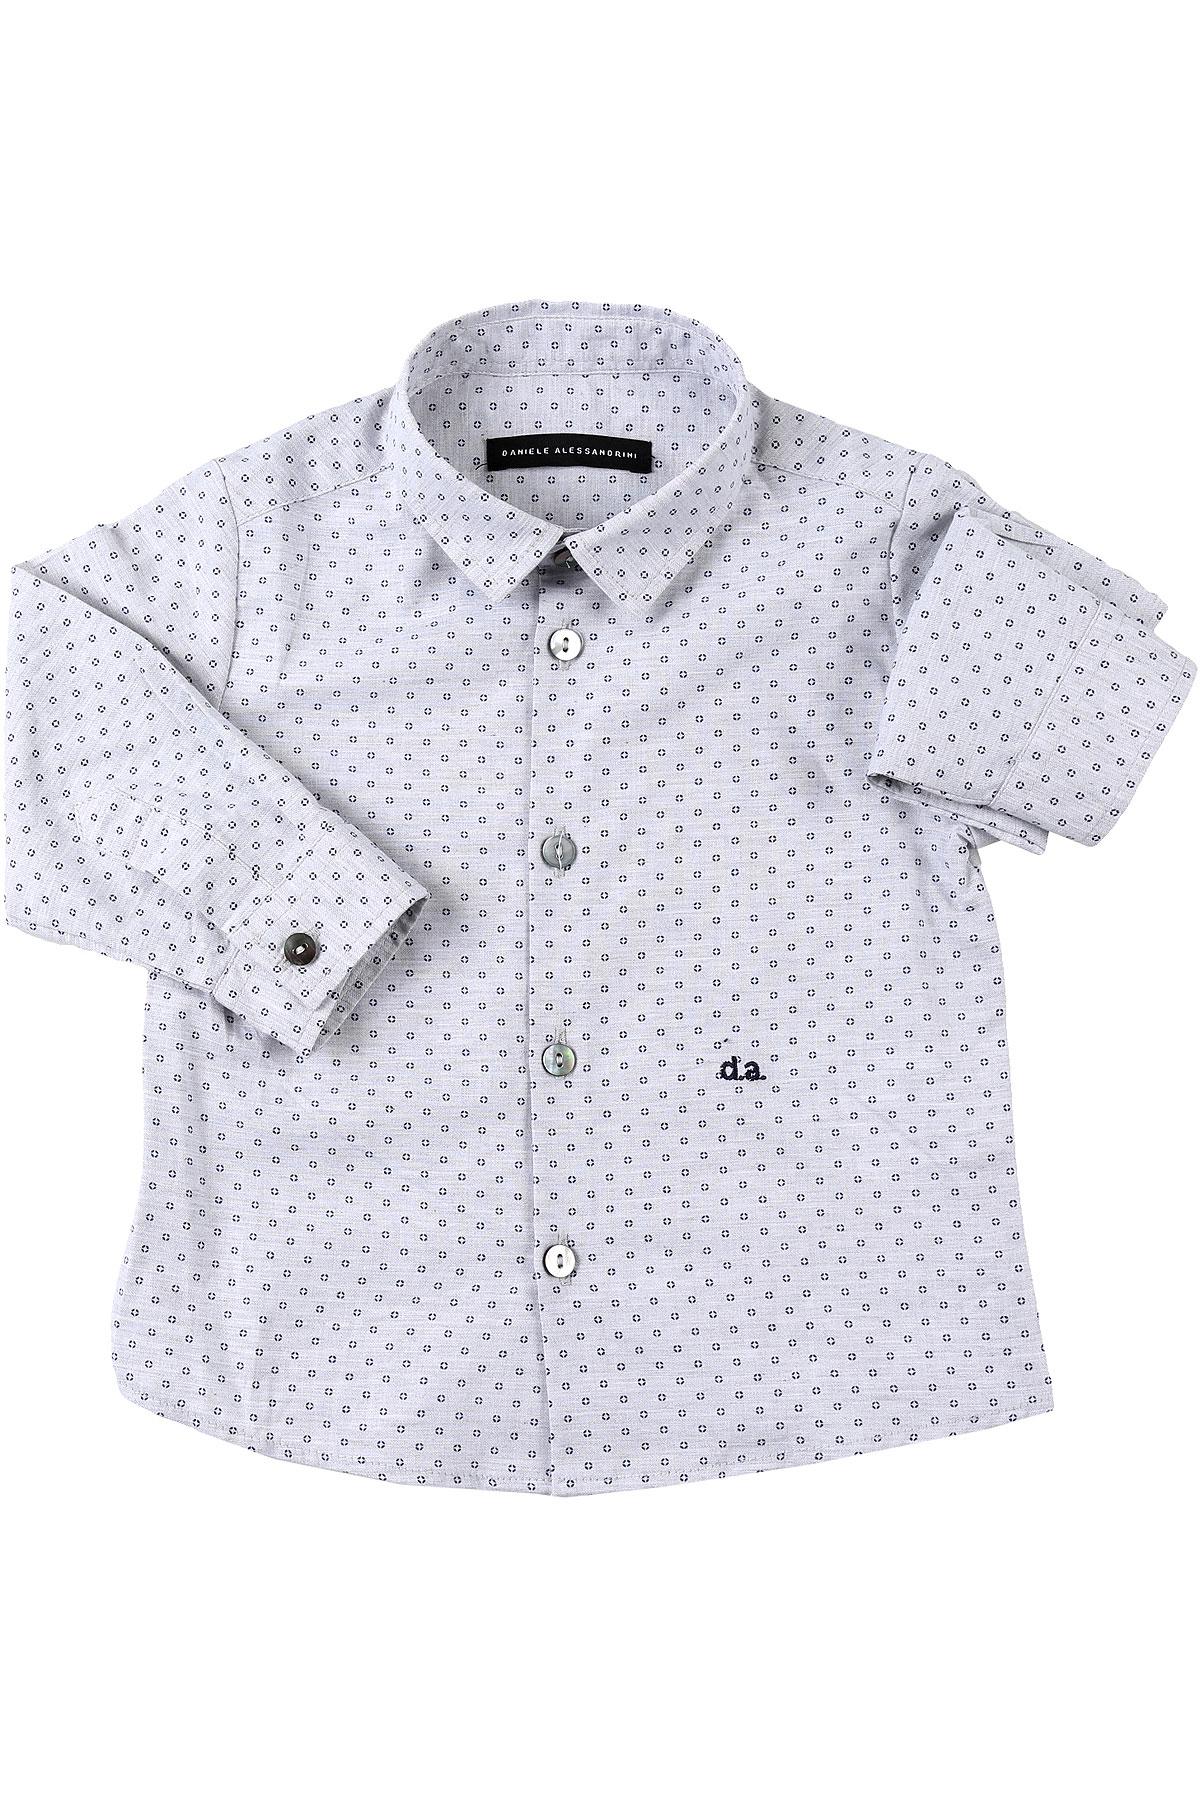 Daniele Alessandrini Baby Shirts for Boys On Sale, Gray, Cotton, 2019, 2Y 3Y 6M 9M